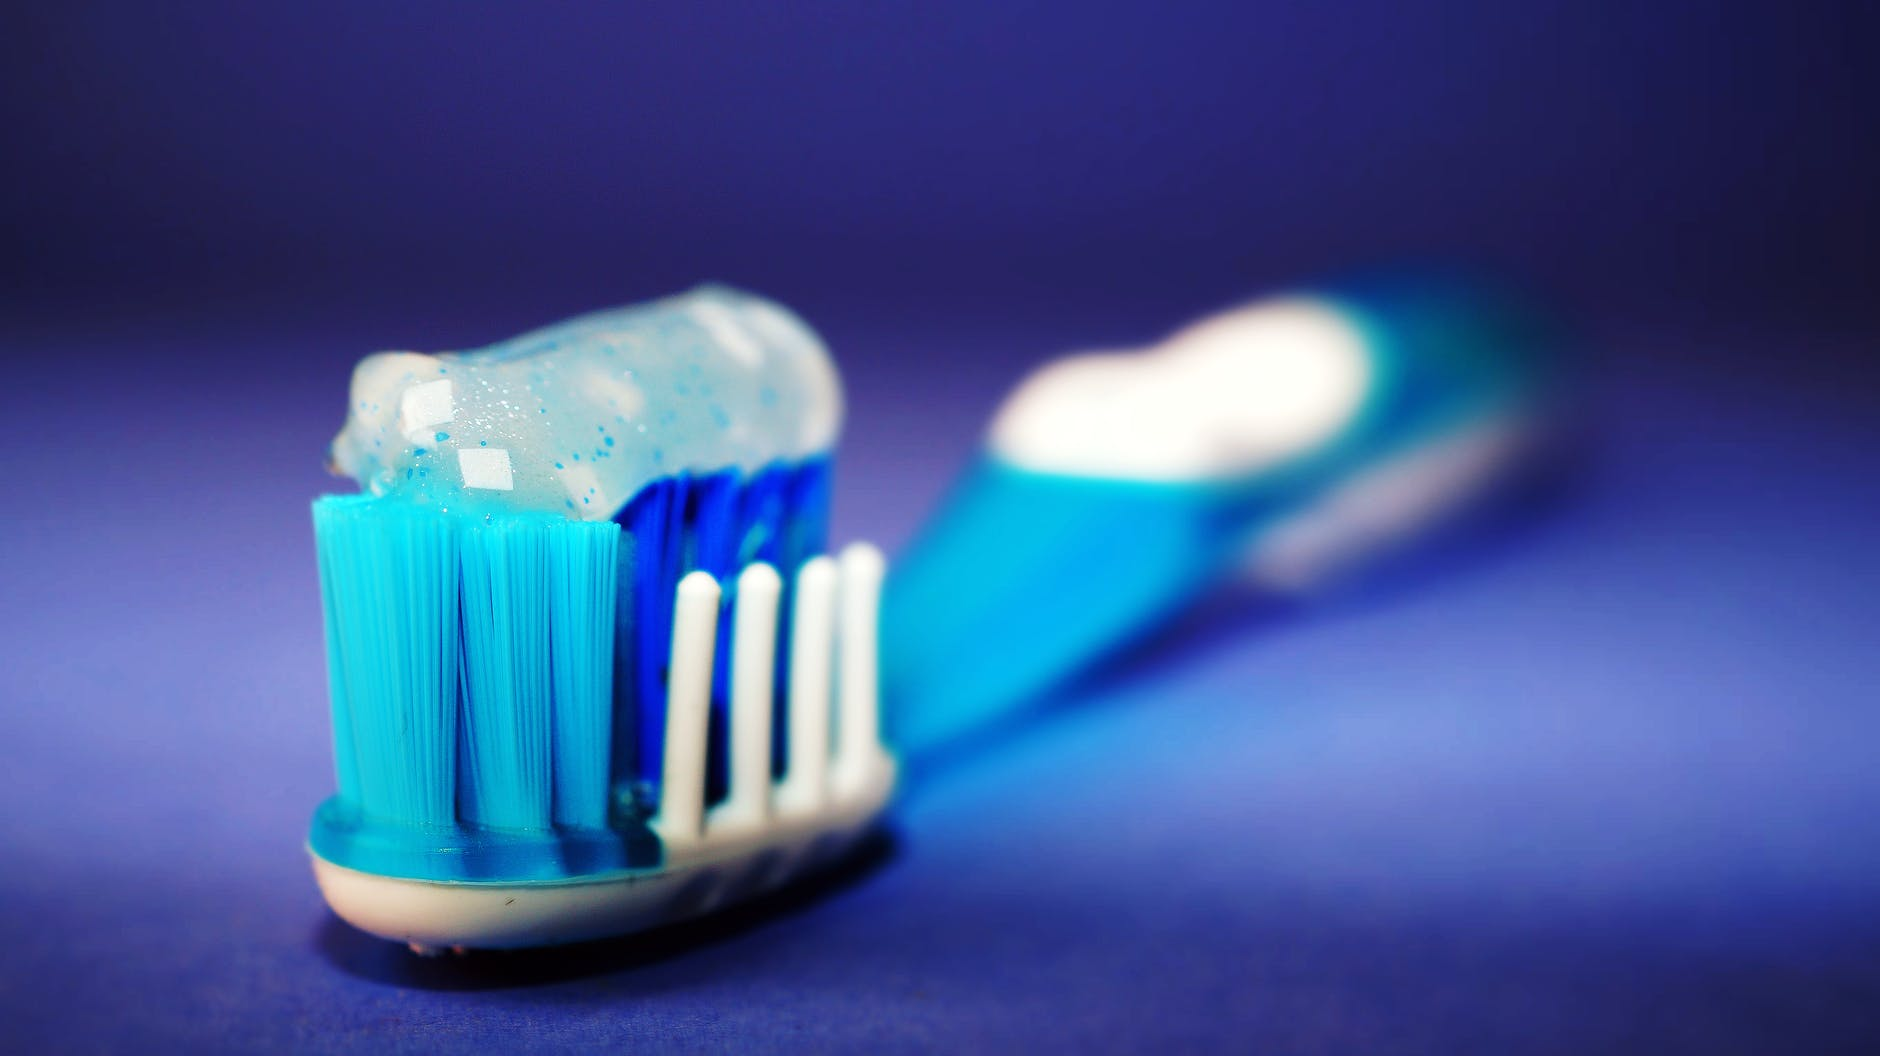 5 Best Practices to Improve Dental Hygiene